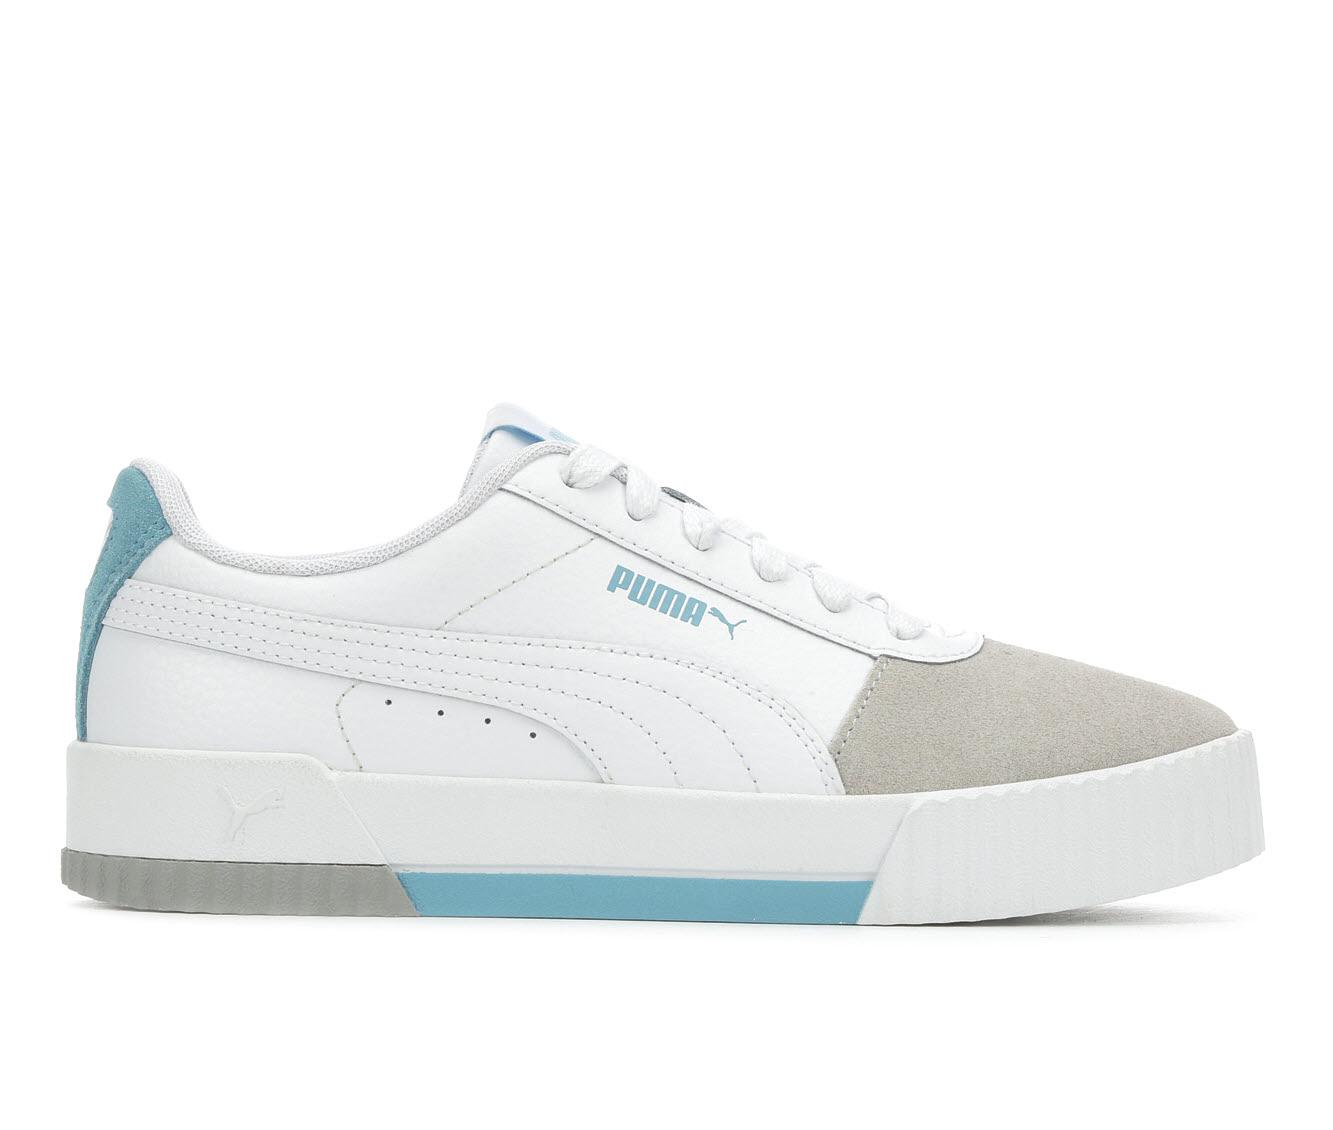 Puma Carina S Leather Women's Athletic Shoe (White)